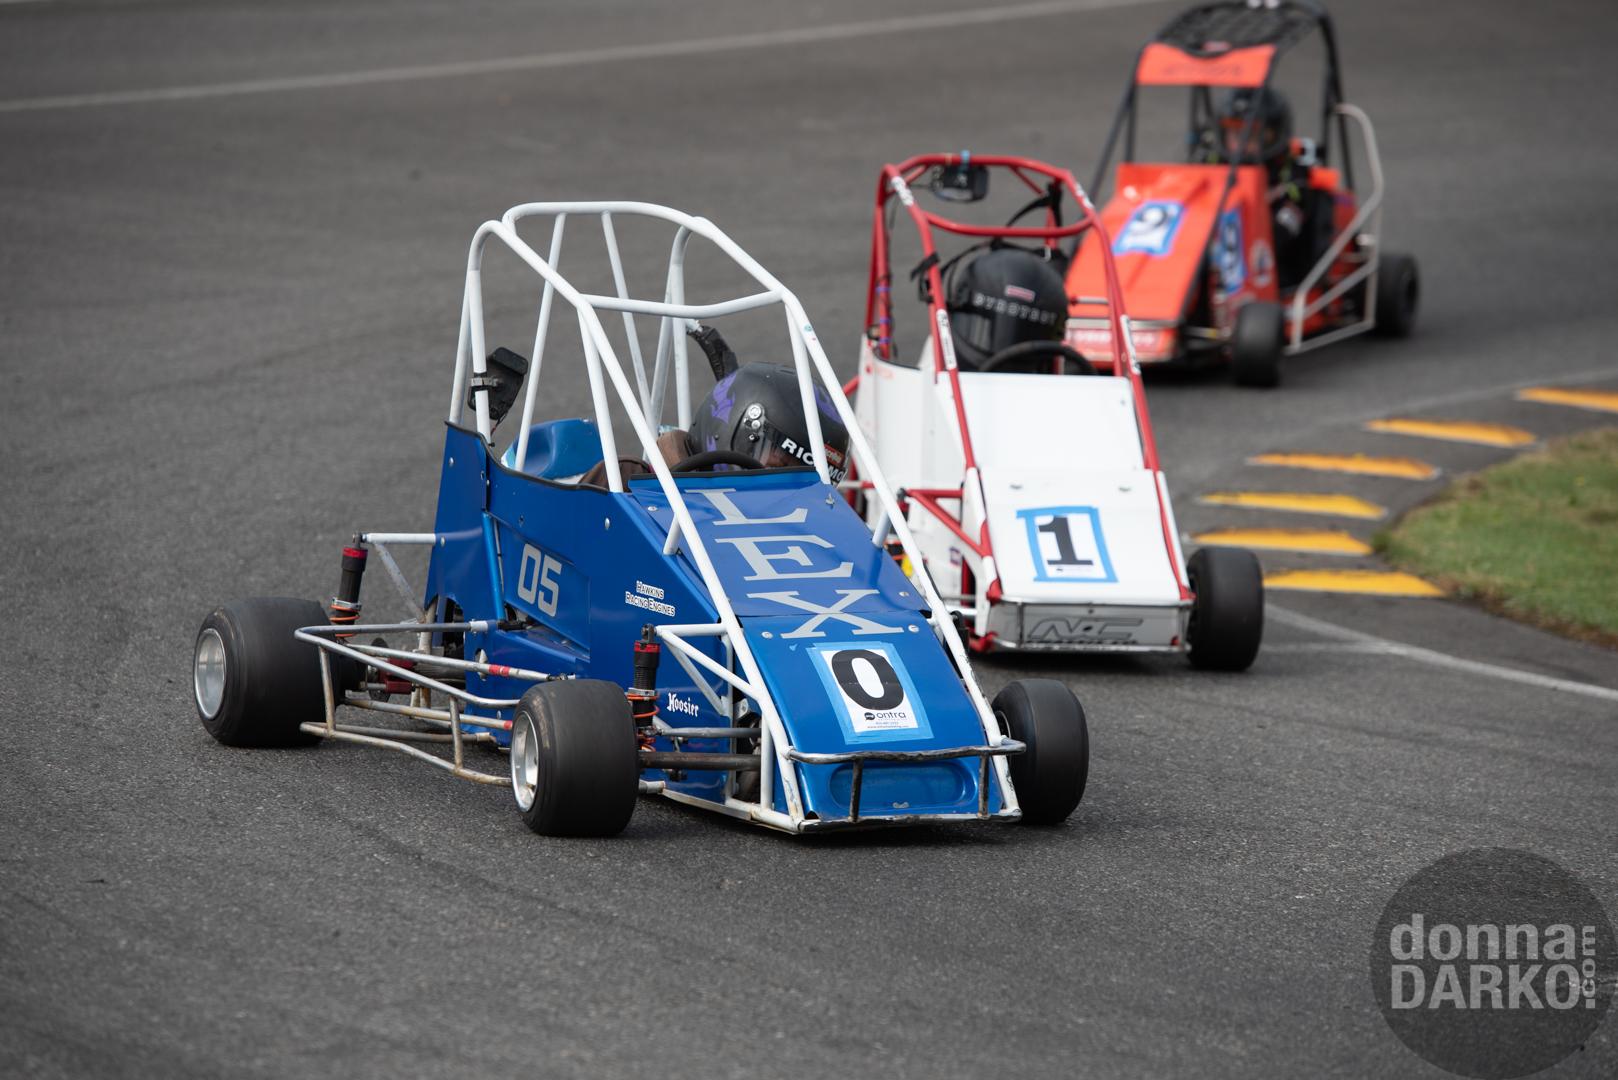 QWMA (Racing) 8-11-2019 DSC_7828.jpg